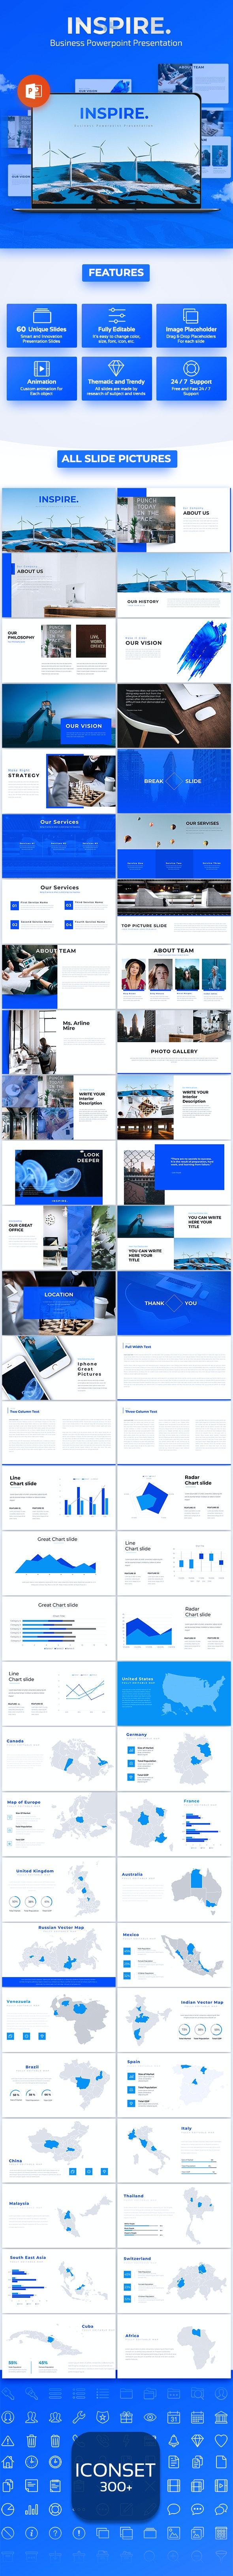 Inspire - Business Powerpoint Presentation - PowerPoint Templates Presentation Templates